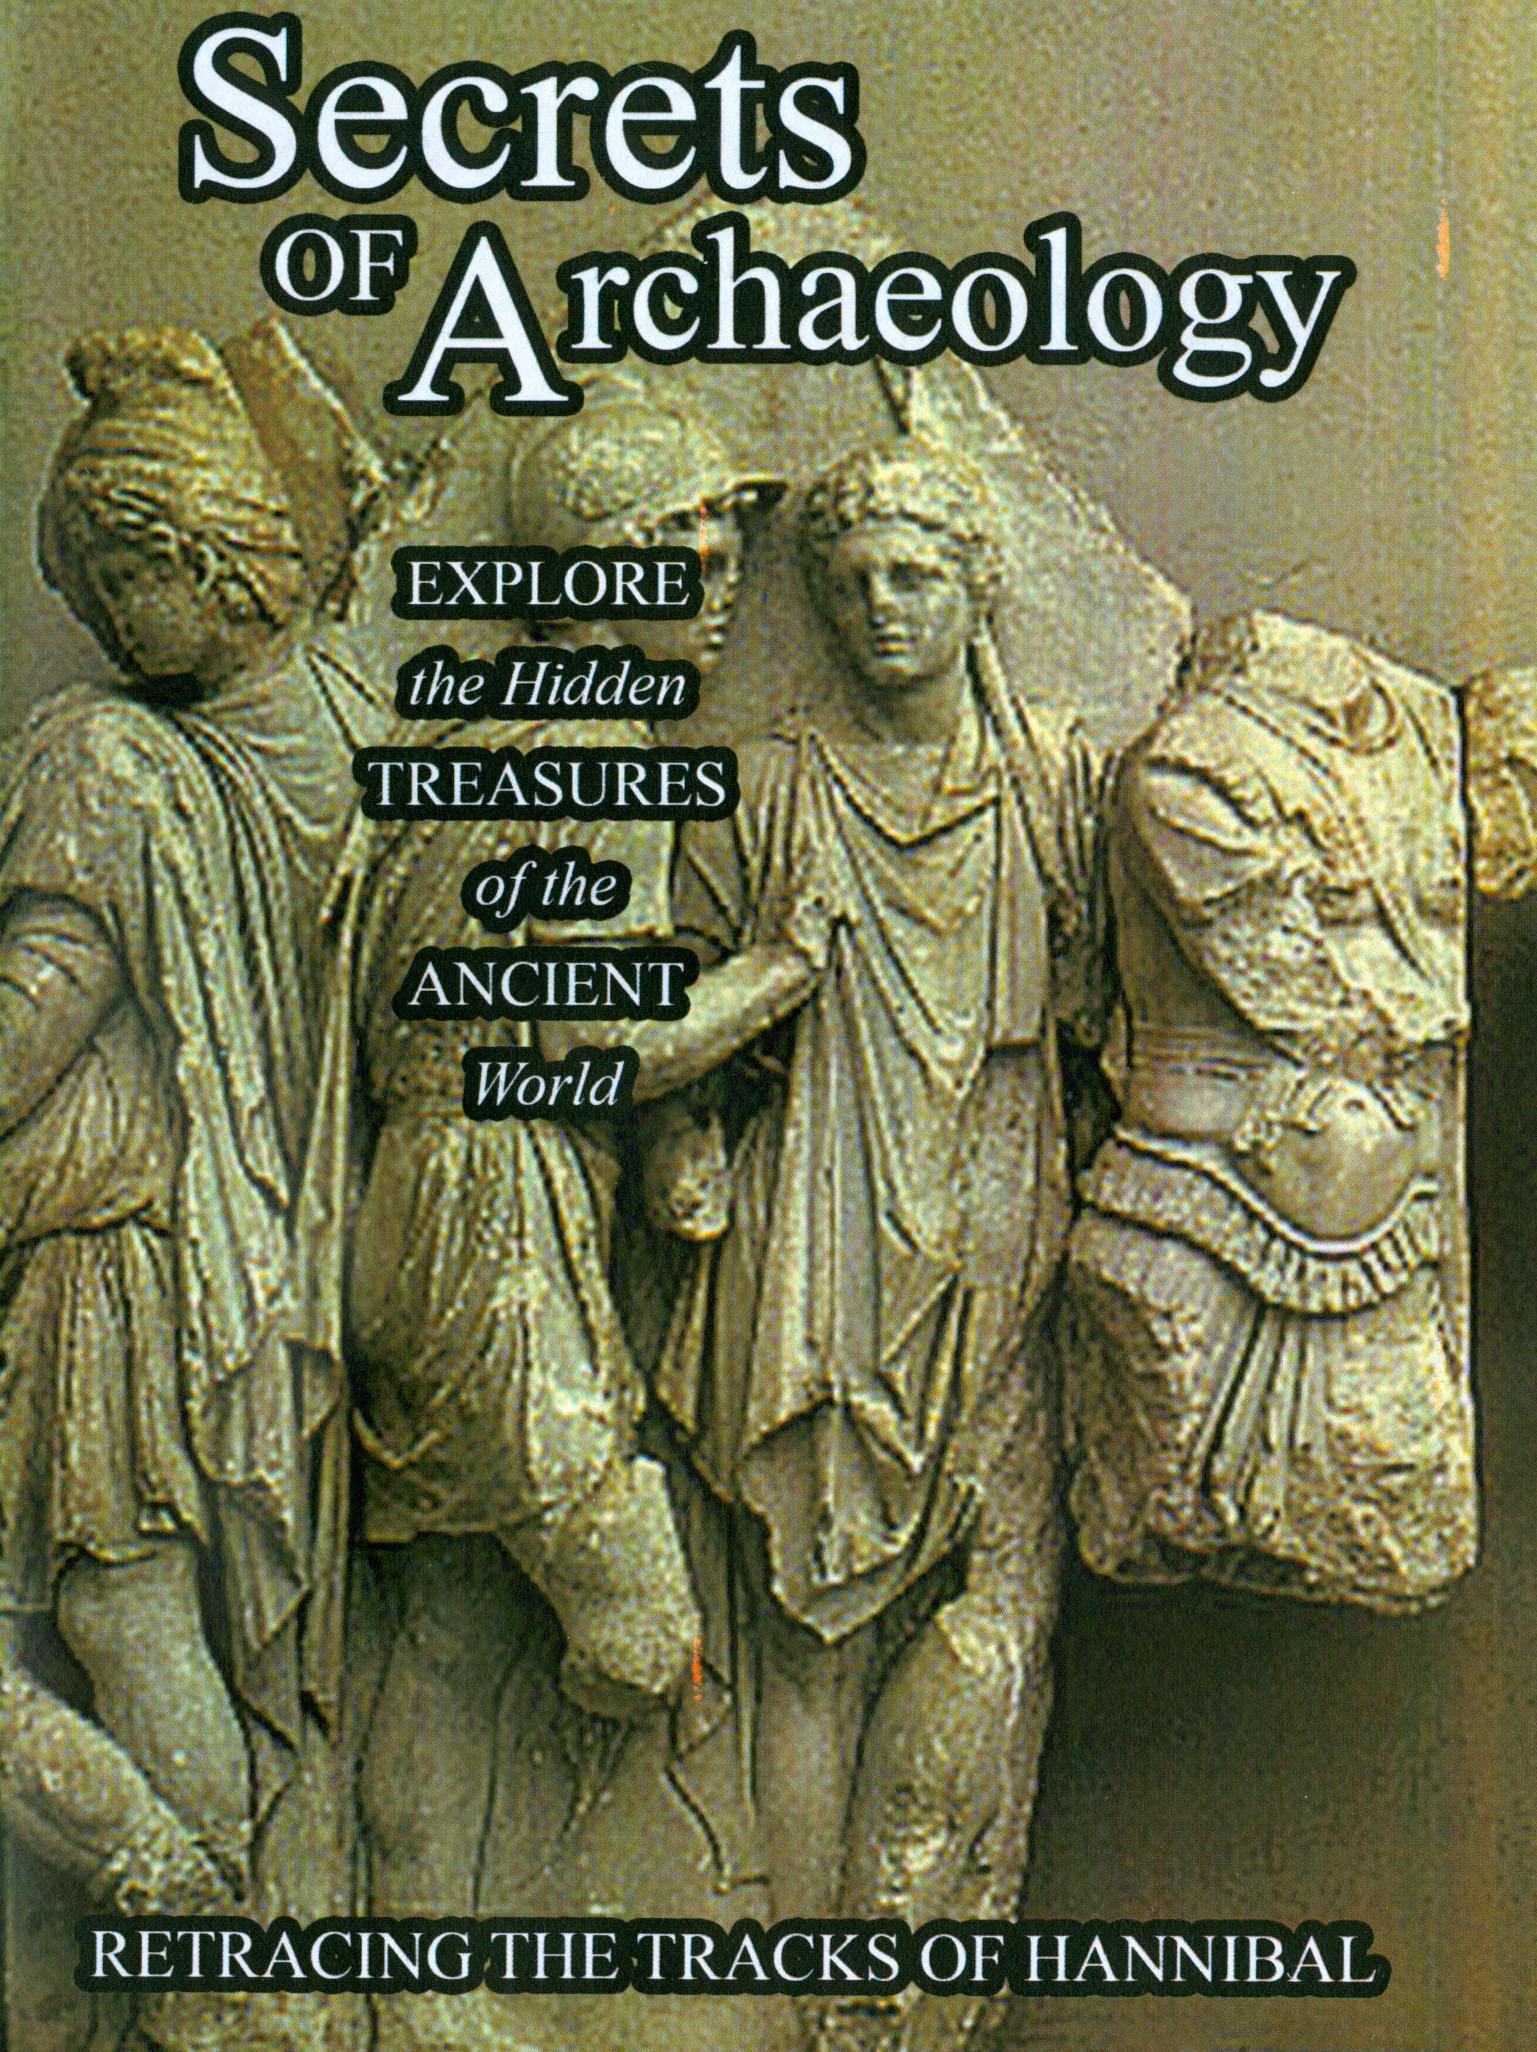 Secrets of Archaeology: Retracing the Tracks of Hannibal